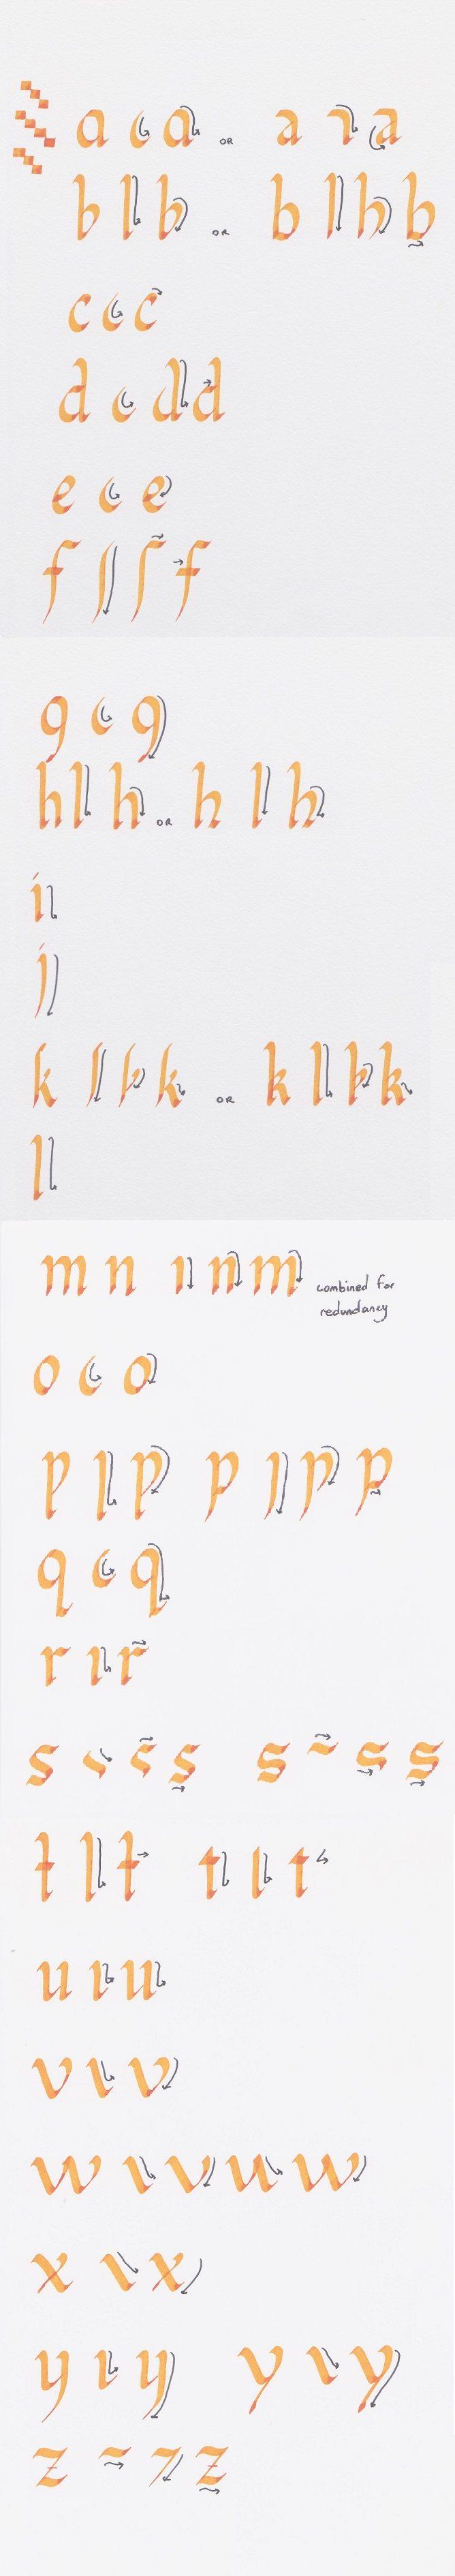 Calligraphy Tutorial- Lowercase Foundational by ~bizmiard on deviantART